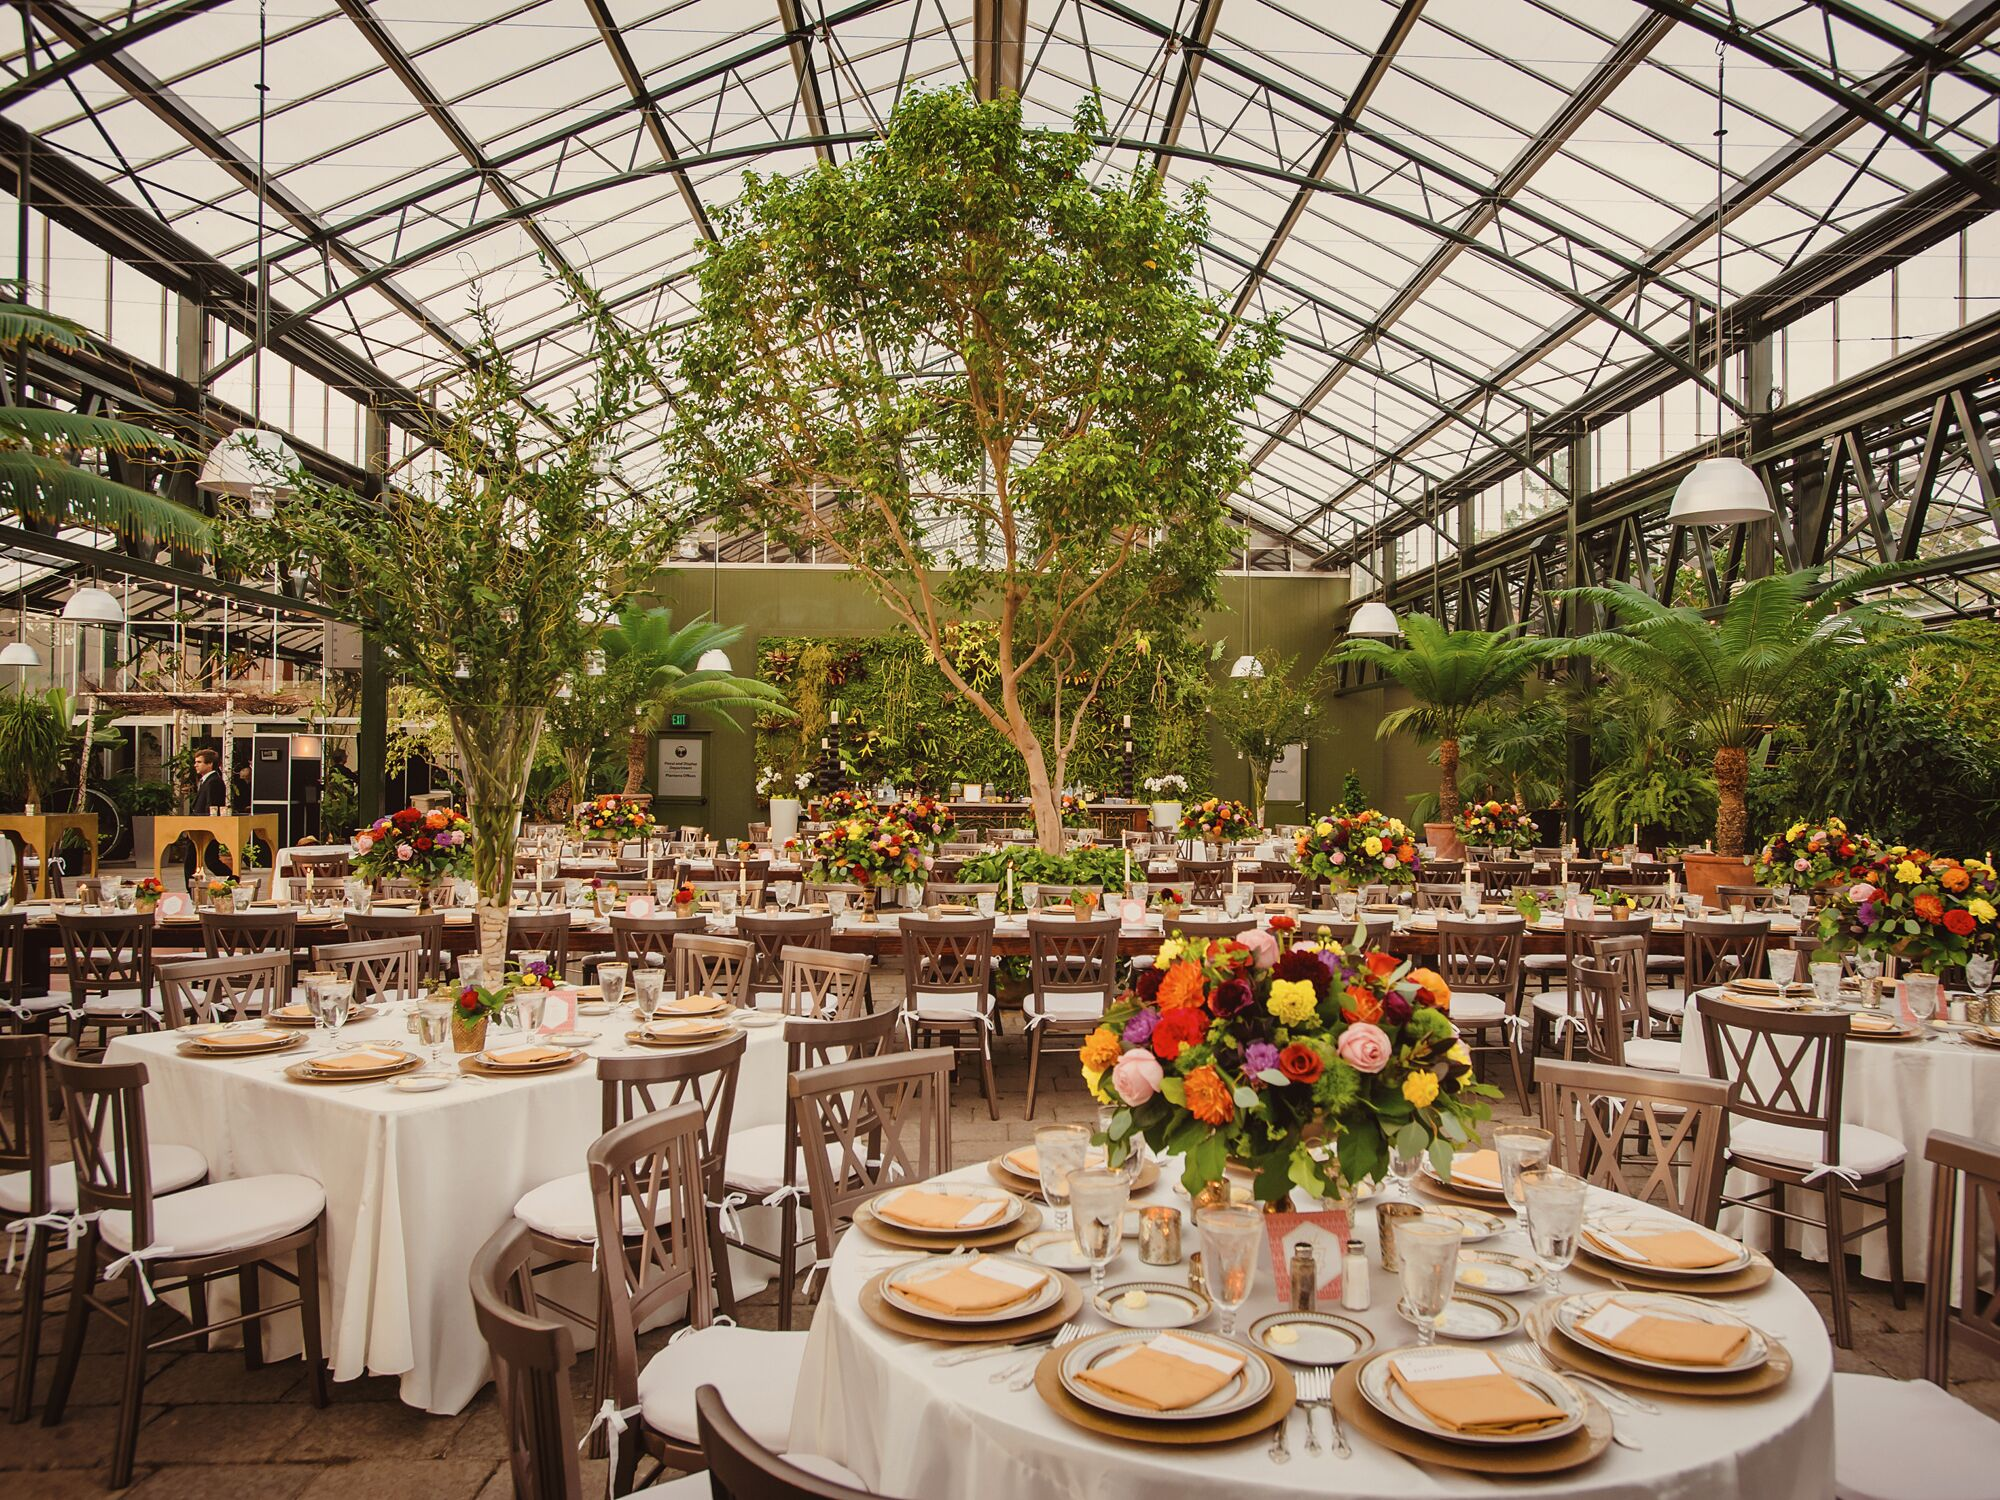 The Most Unique Wedding Venues Weve Ever Seen